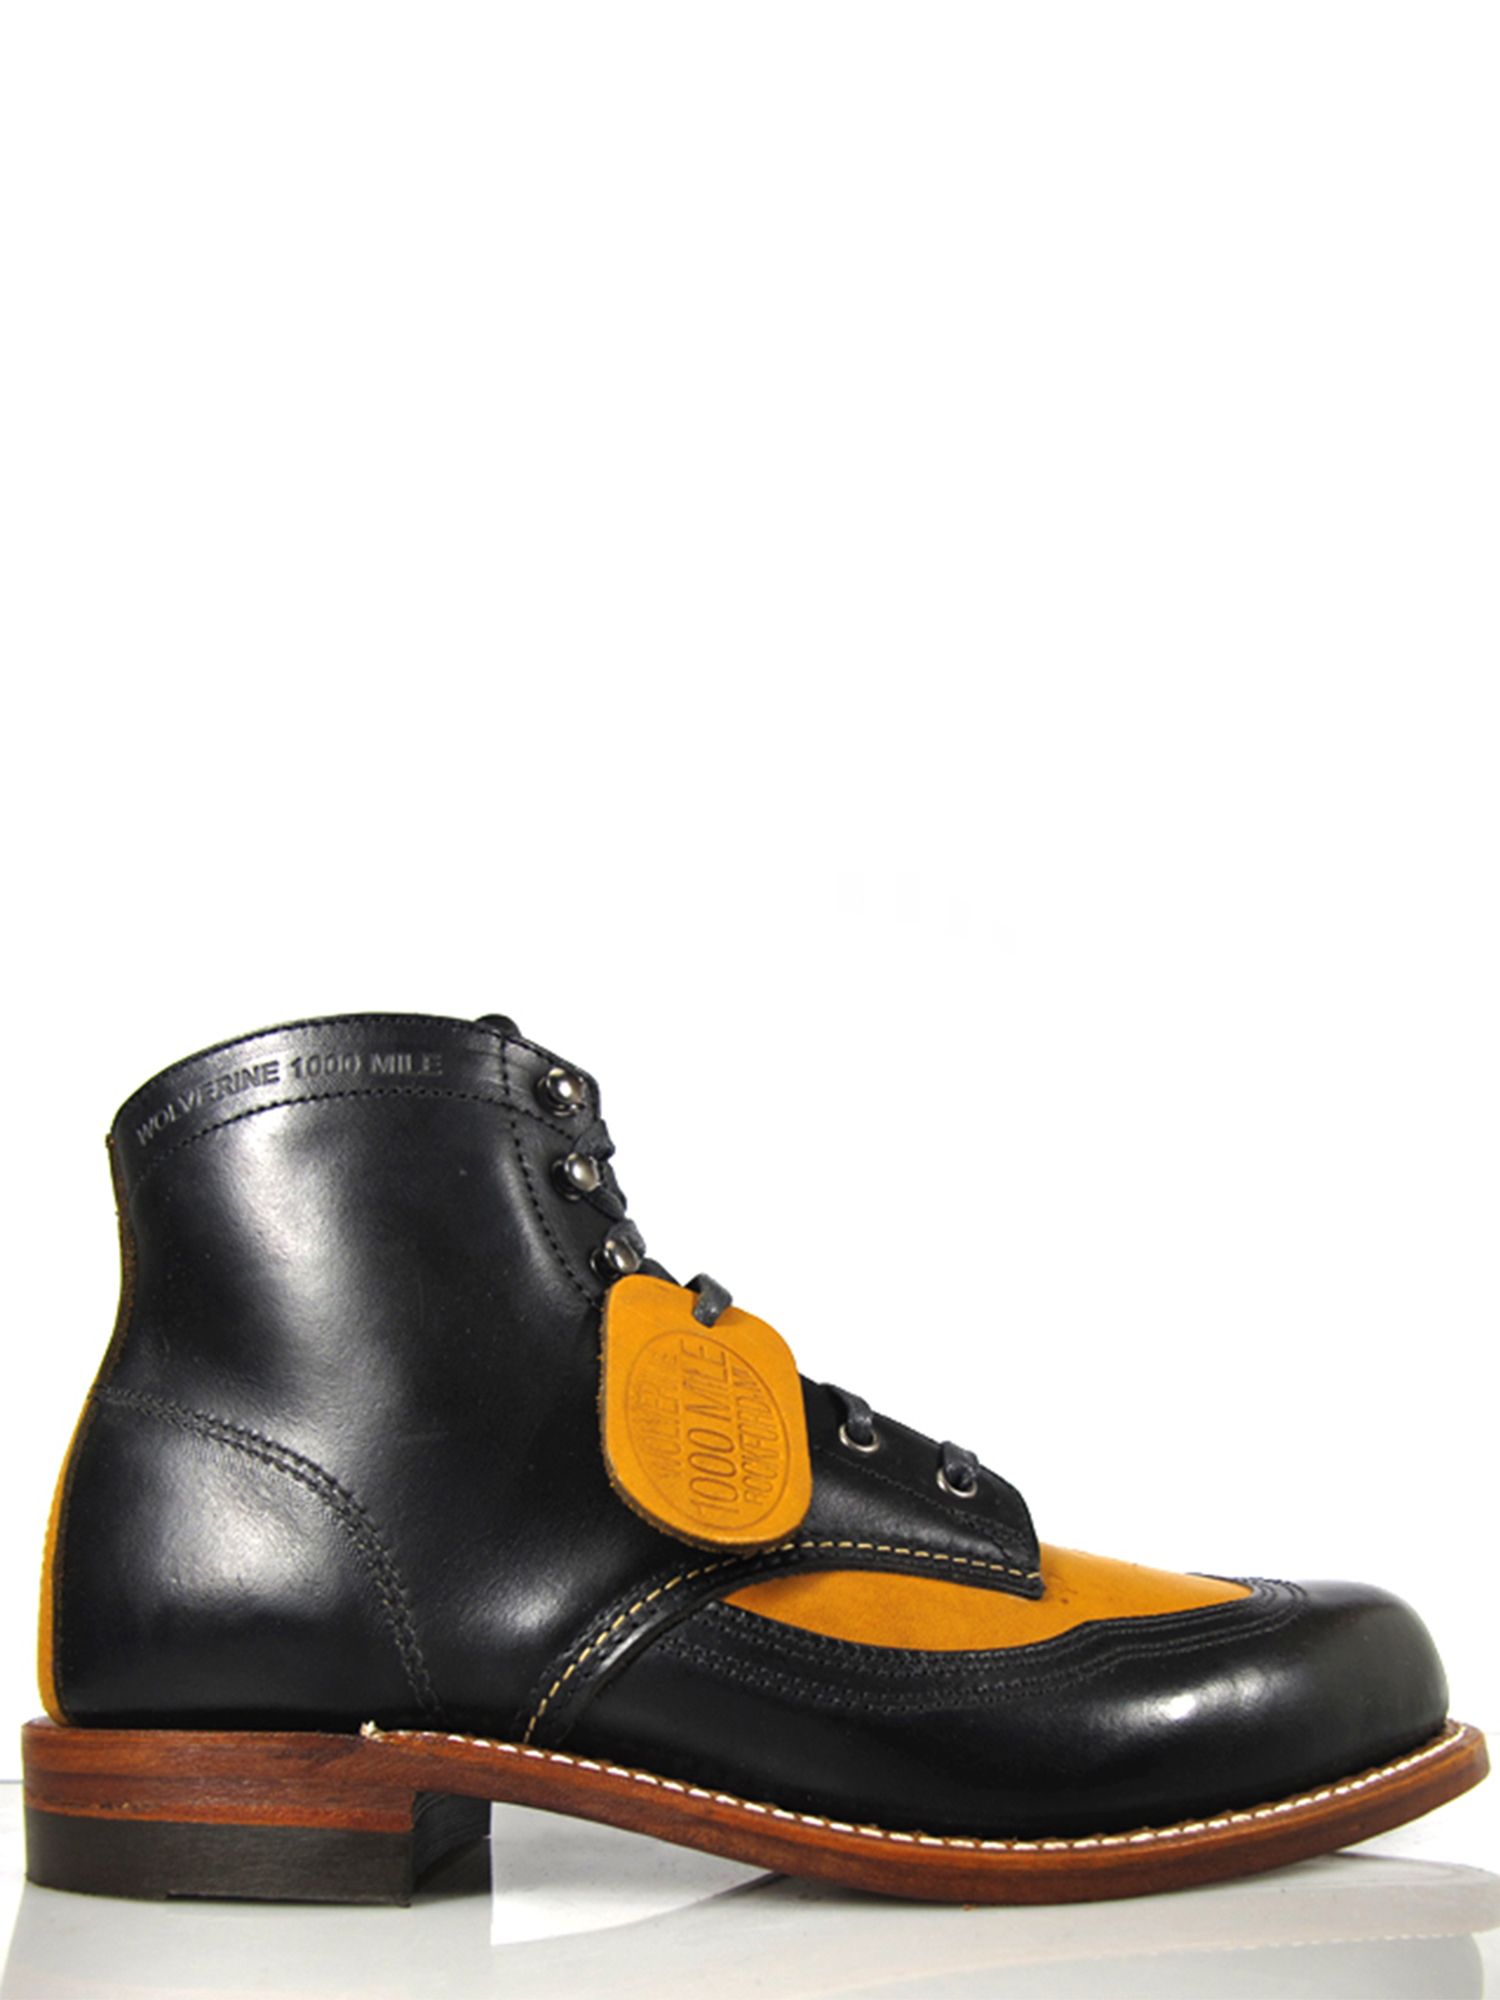 Wolverine Men's Addison 1000 Mile Wingtip Boots W05922 Black Tan by